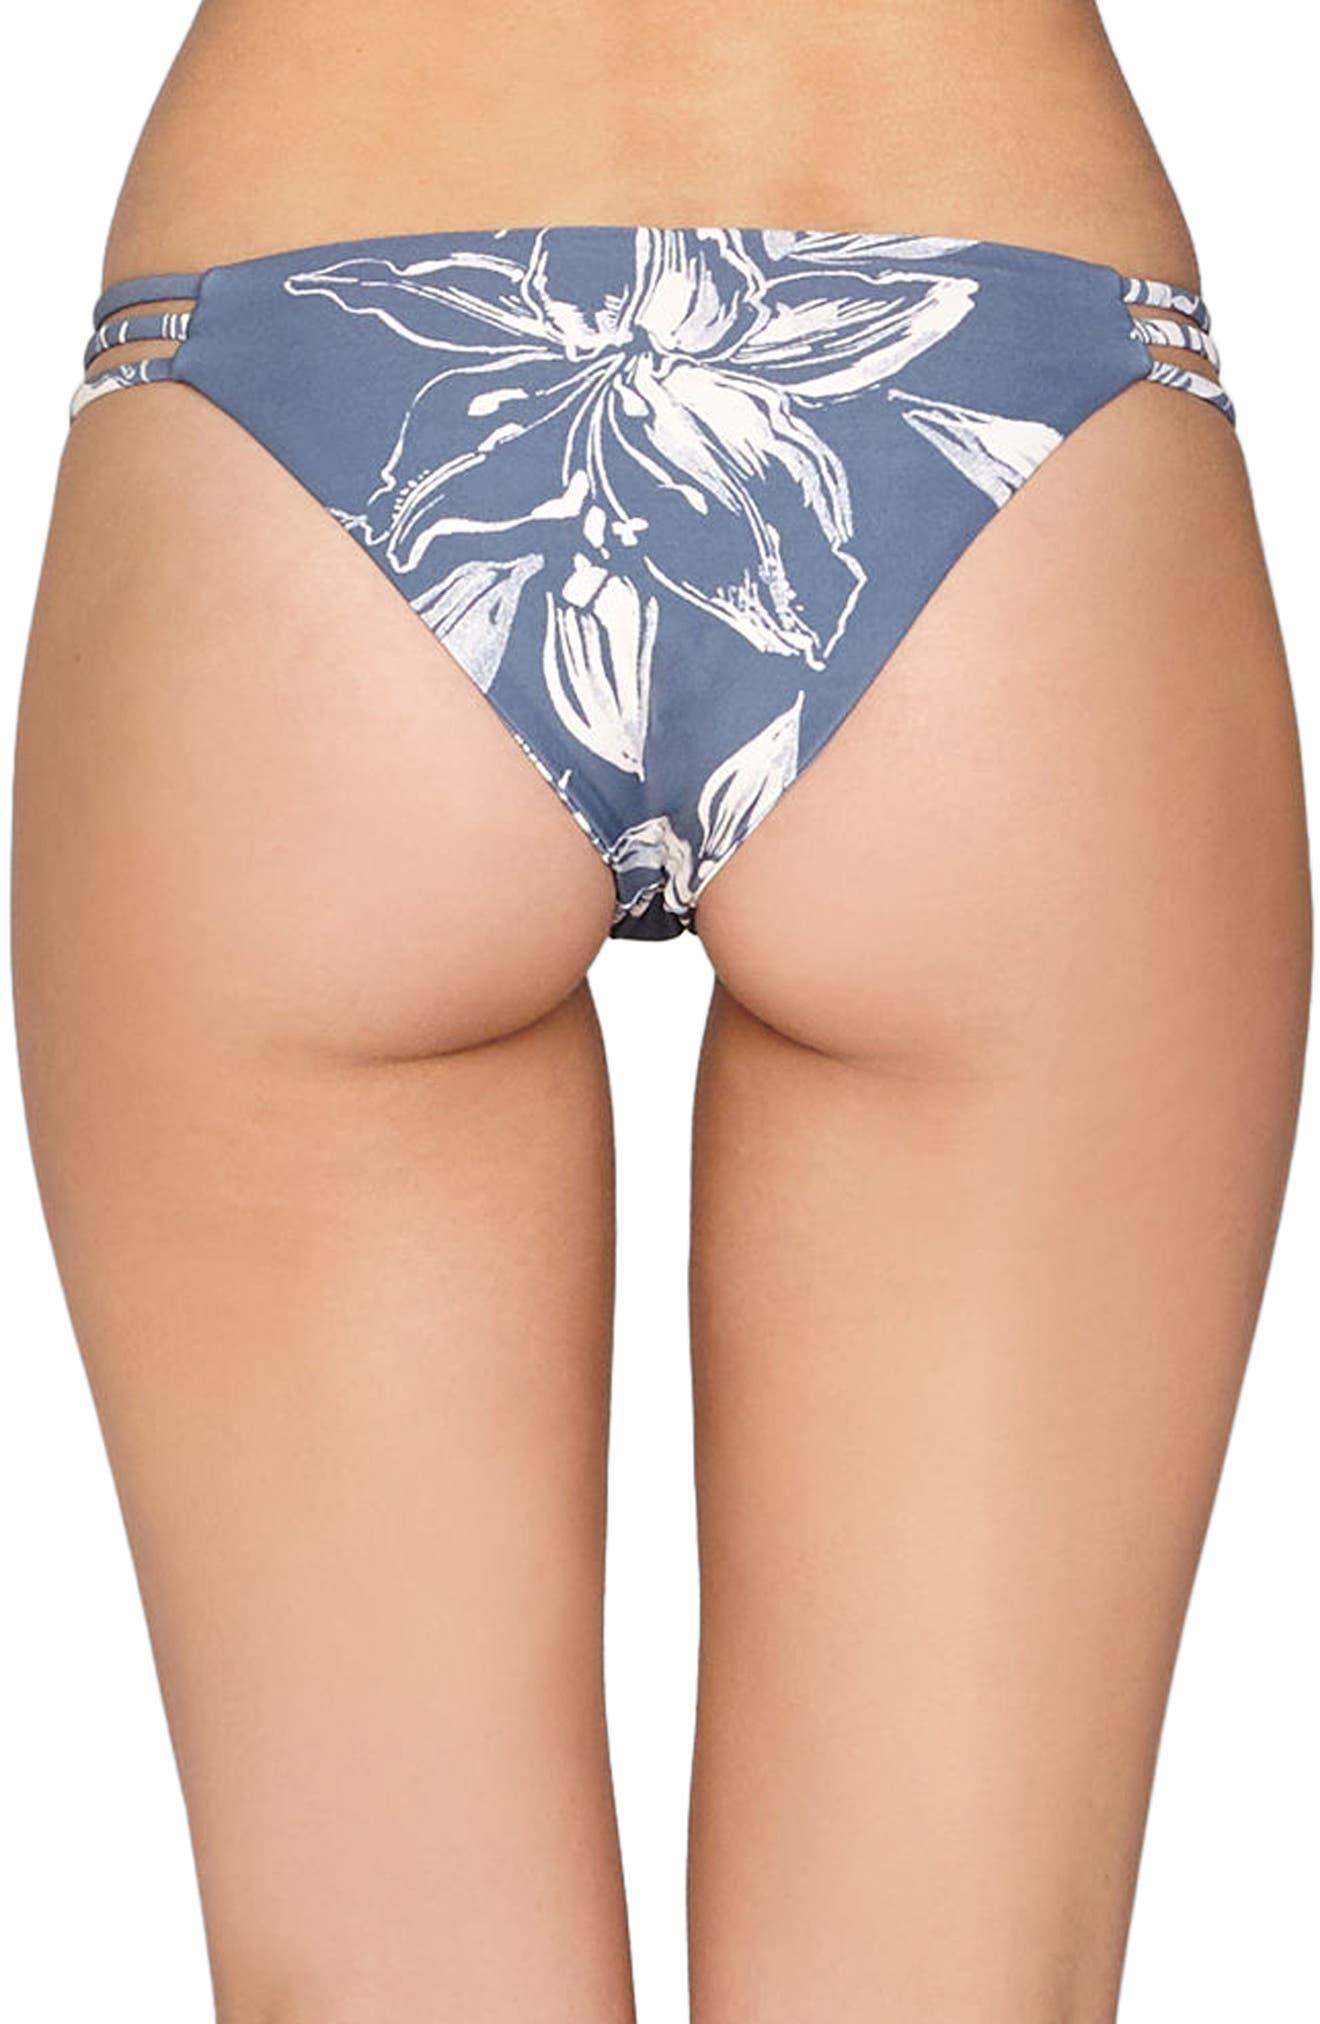 Alternate Image 2  - Amuse Society Domino Skimpy Bikini Bottoms